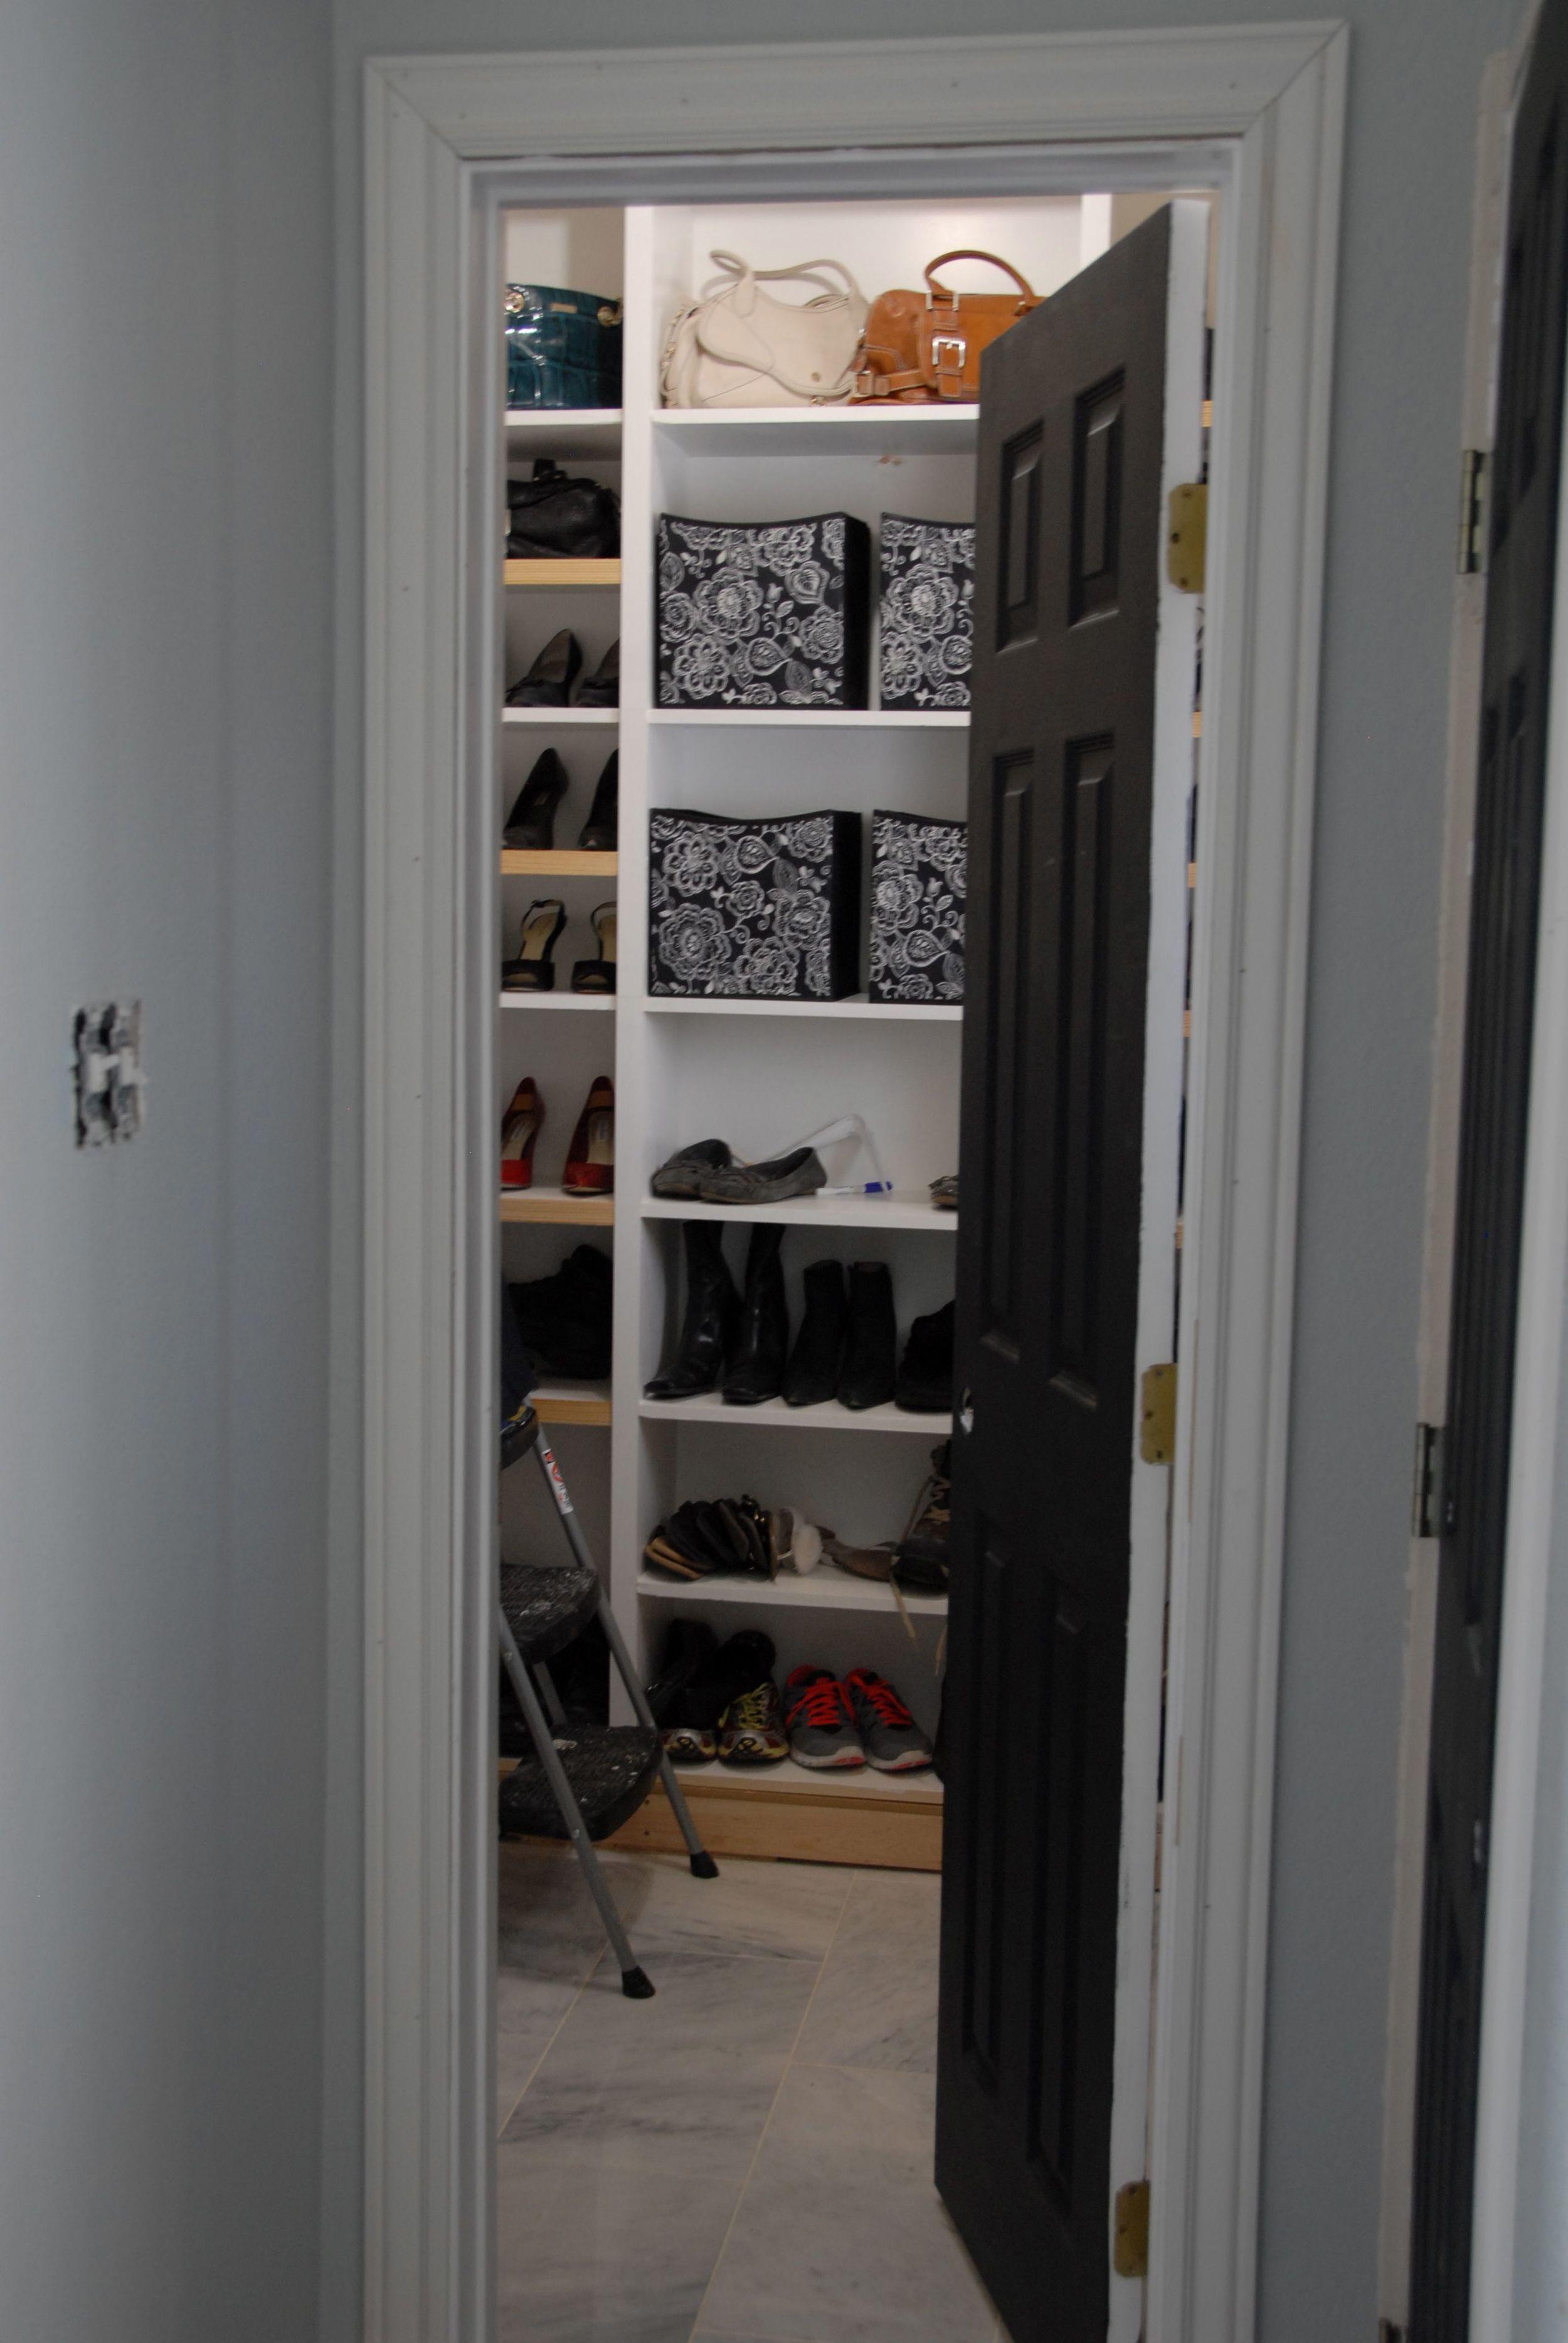 A Peek Inside My Newest Project - Custom Closet